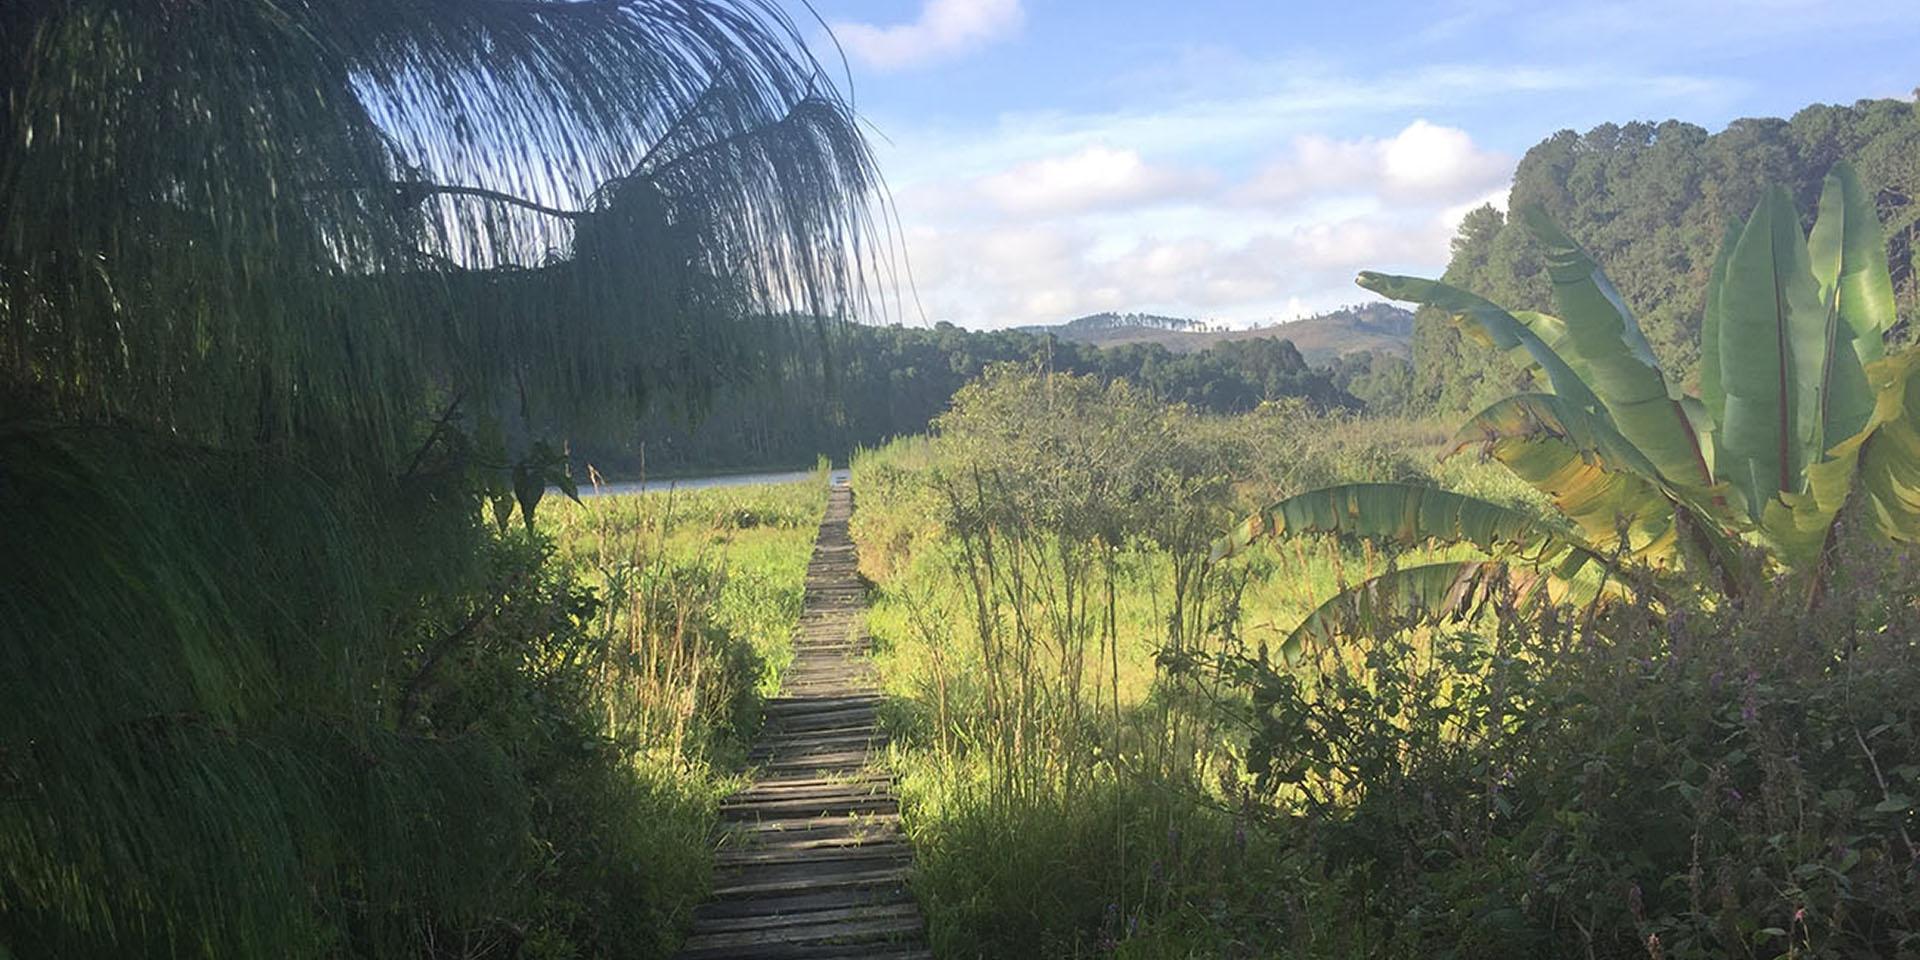 viphya plateau tours malawian-style-malawi-adventures-experiences-specialist-tour-operator-luwawa-forest-lodge-walkway